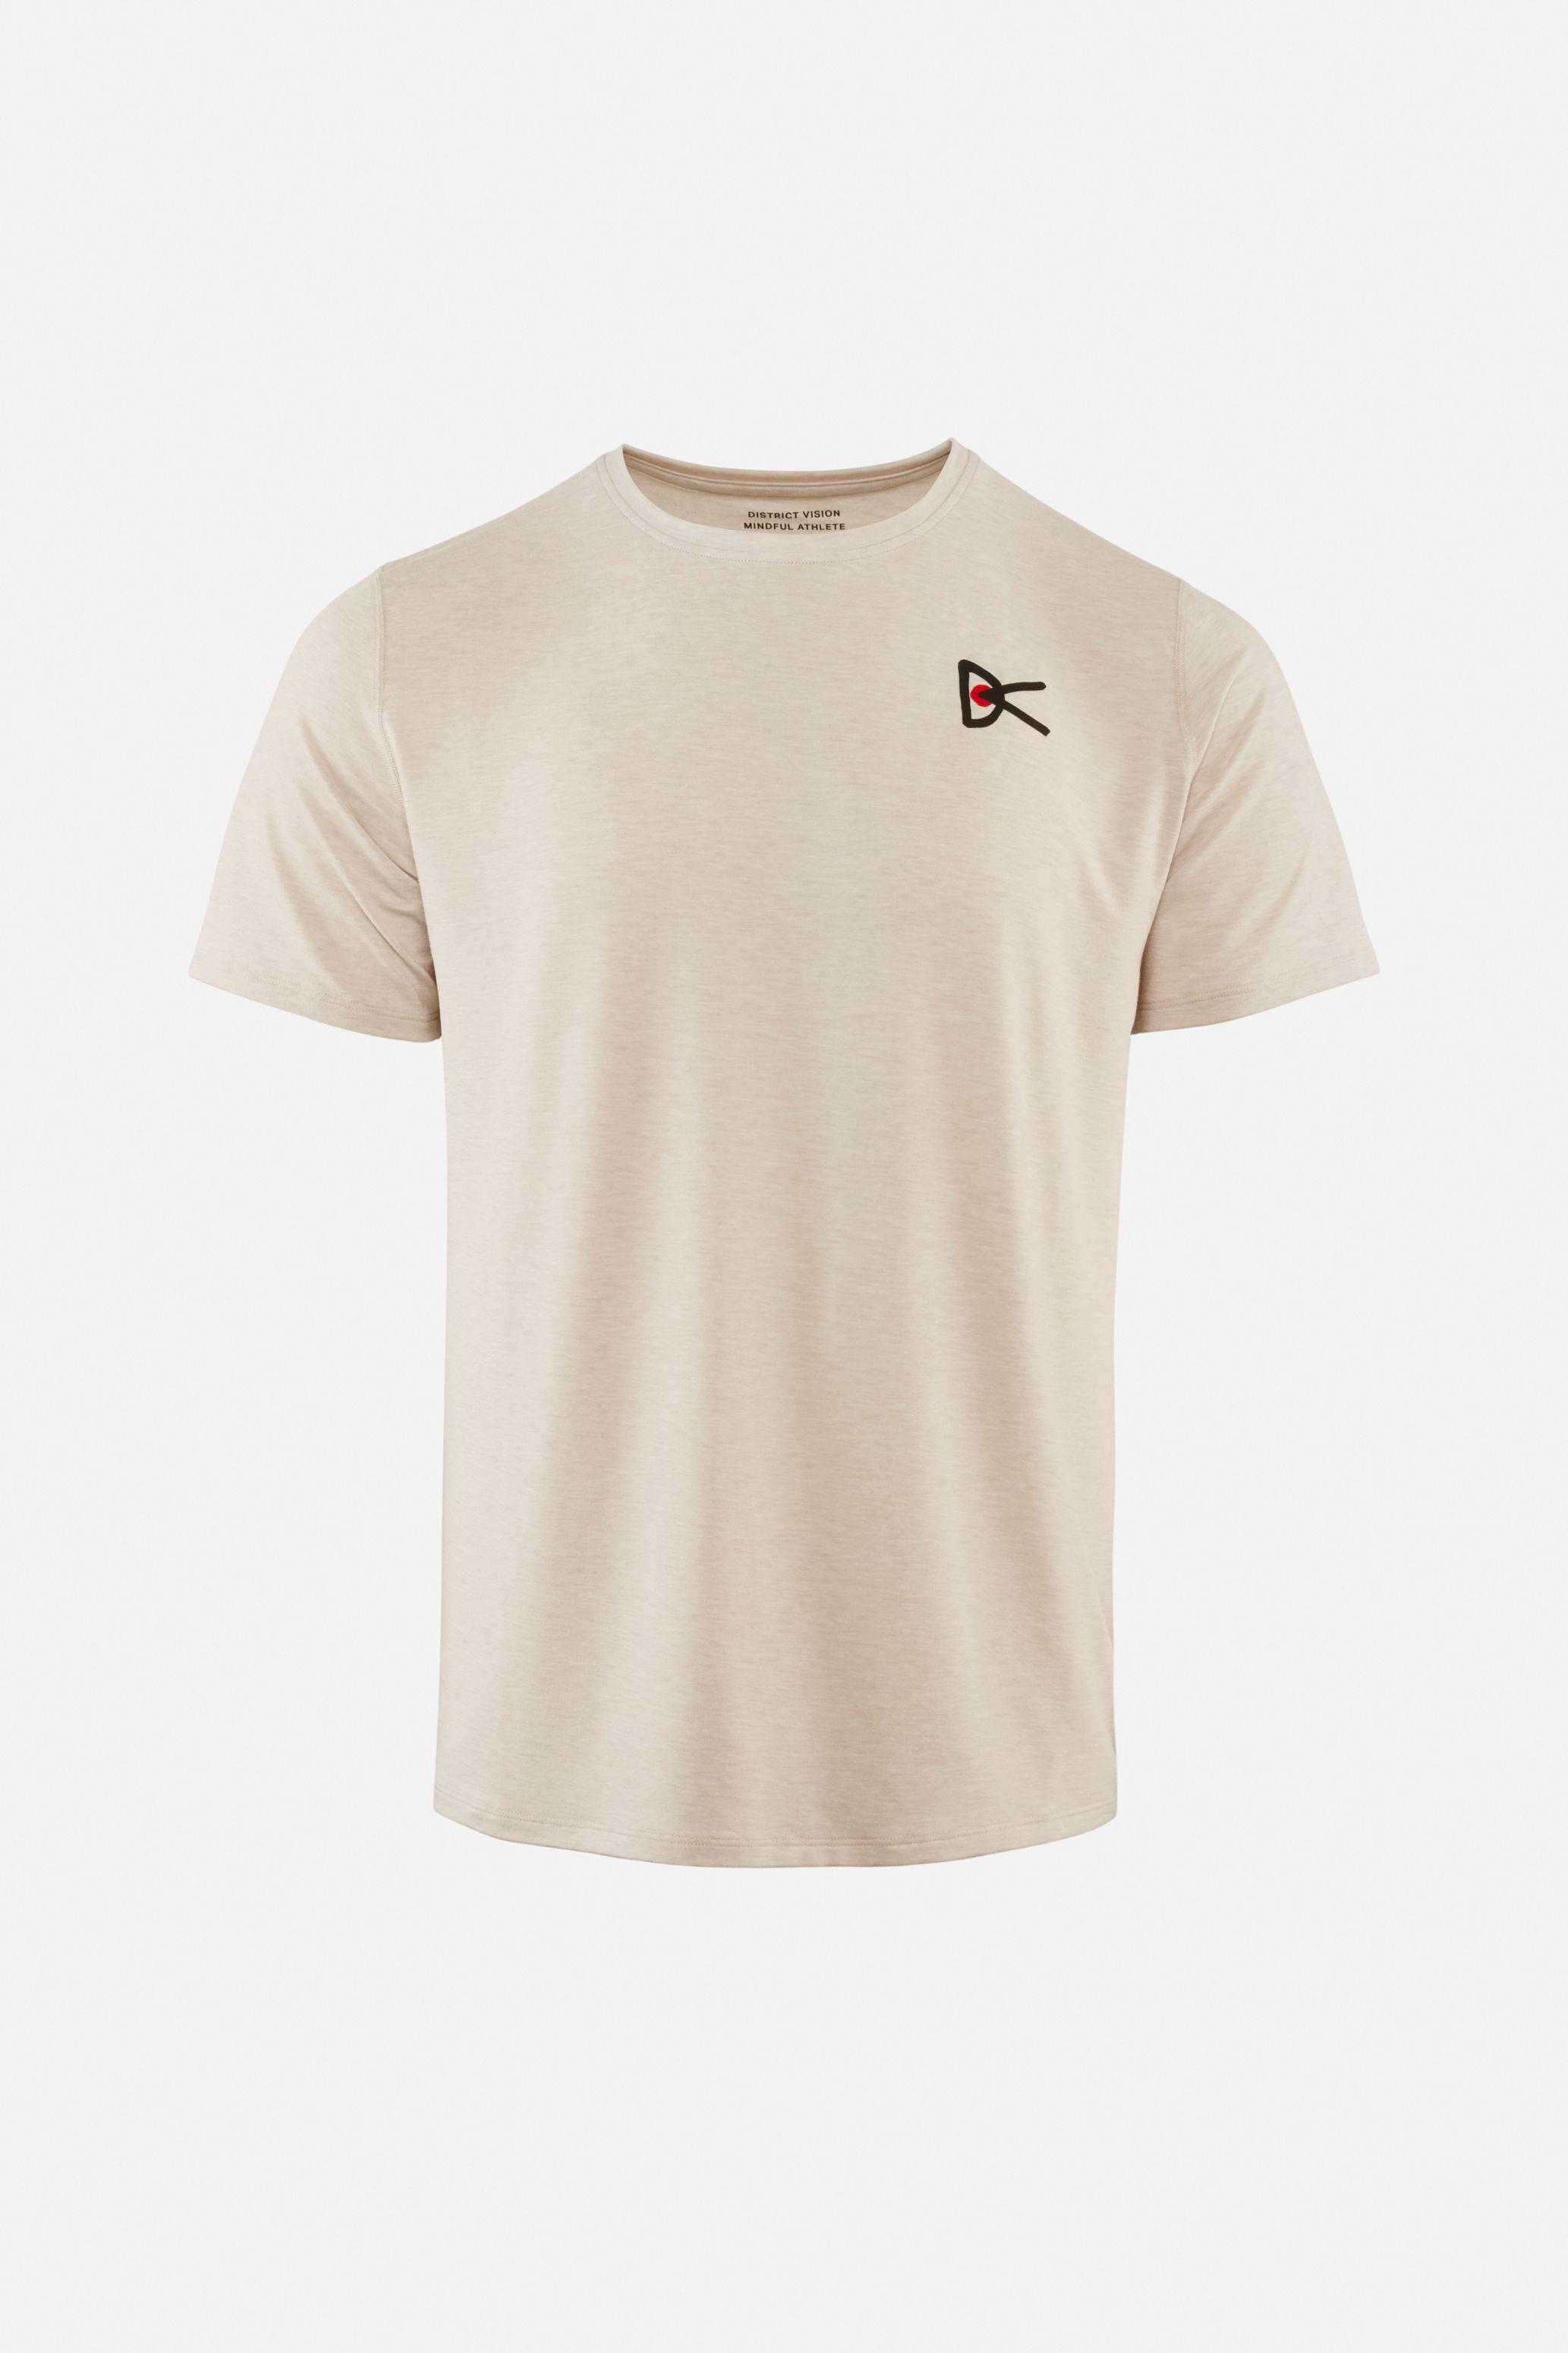 Tadasana Short Sleeve T-Shirt, Oatmeal